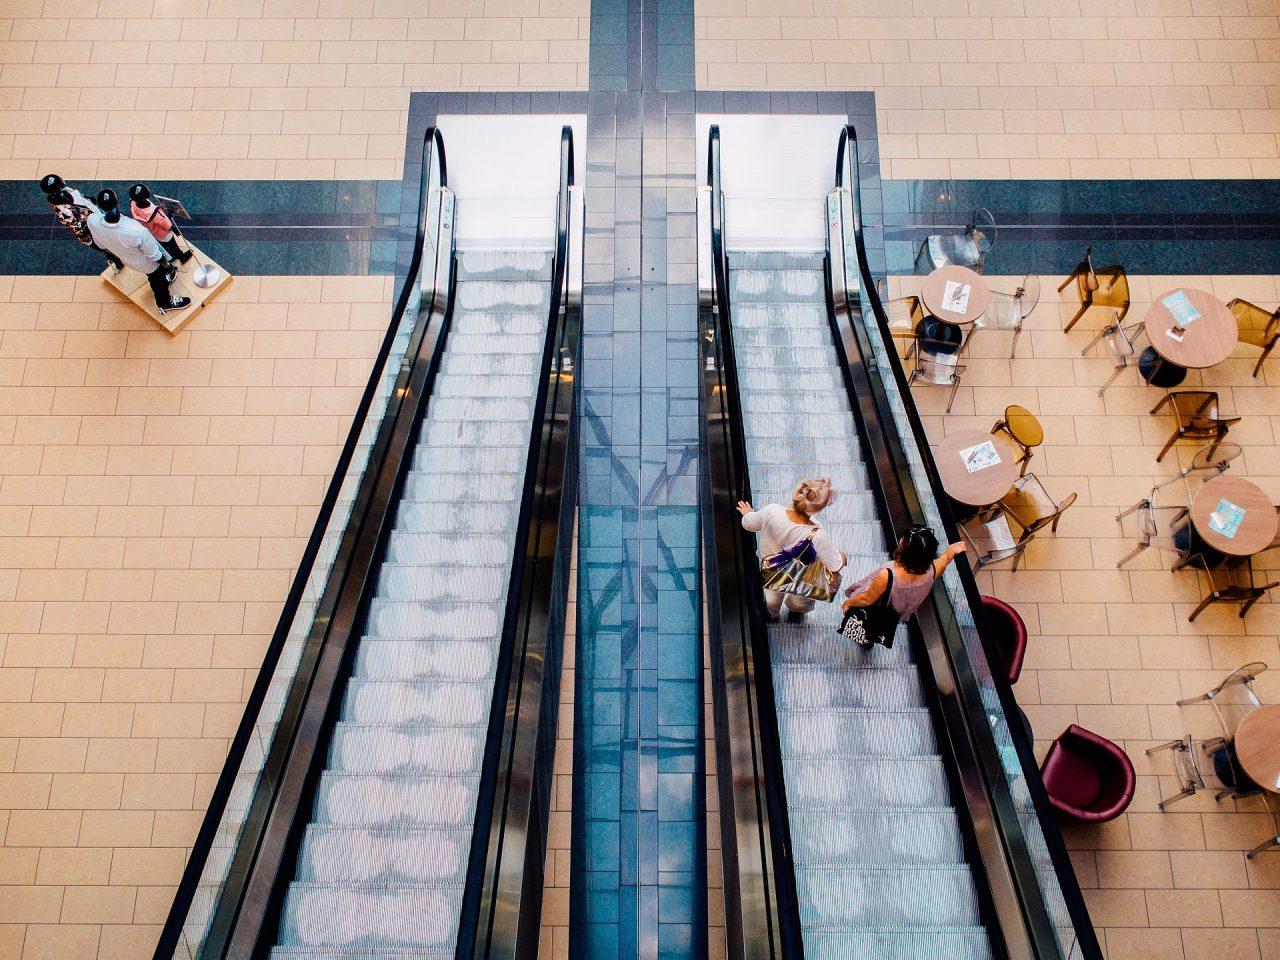 mall-893205_1920-1280x960.jpg